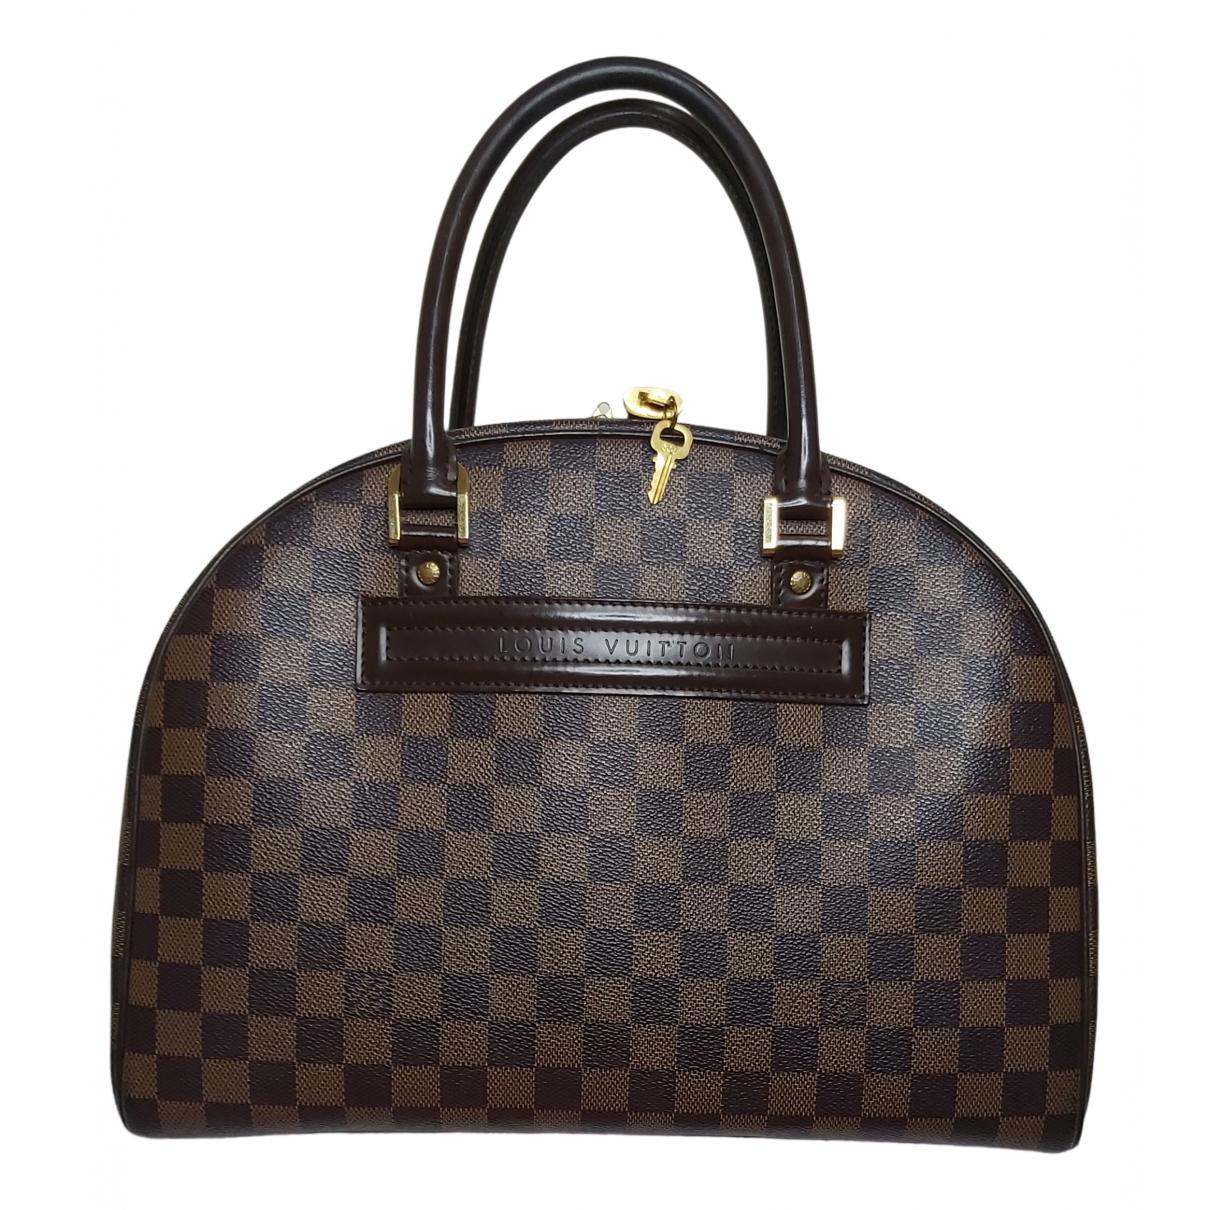 Louis Vuitton - Sac a main Nolita pour femme en toile - marron